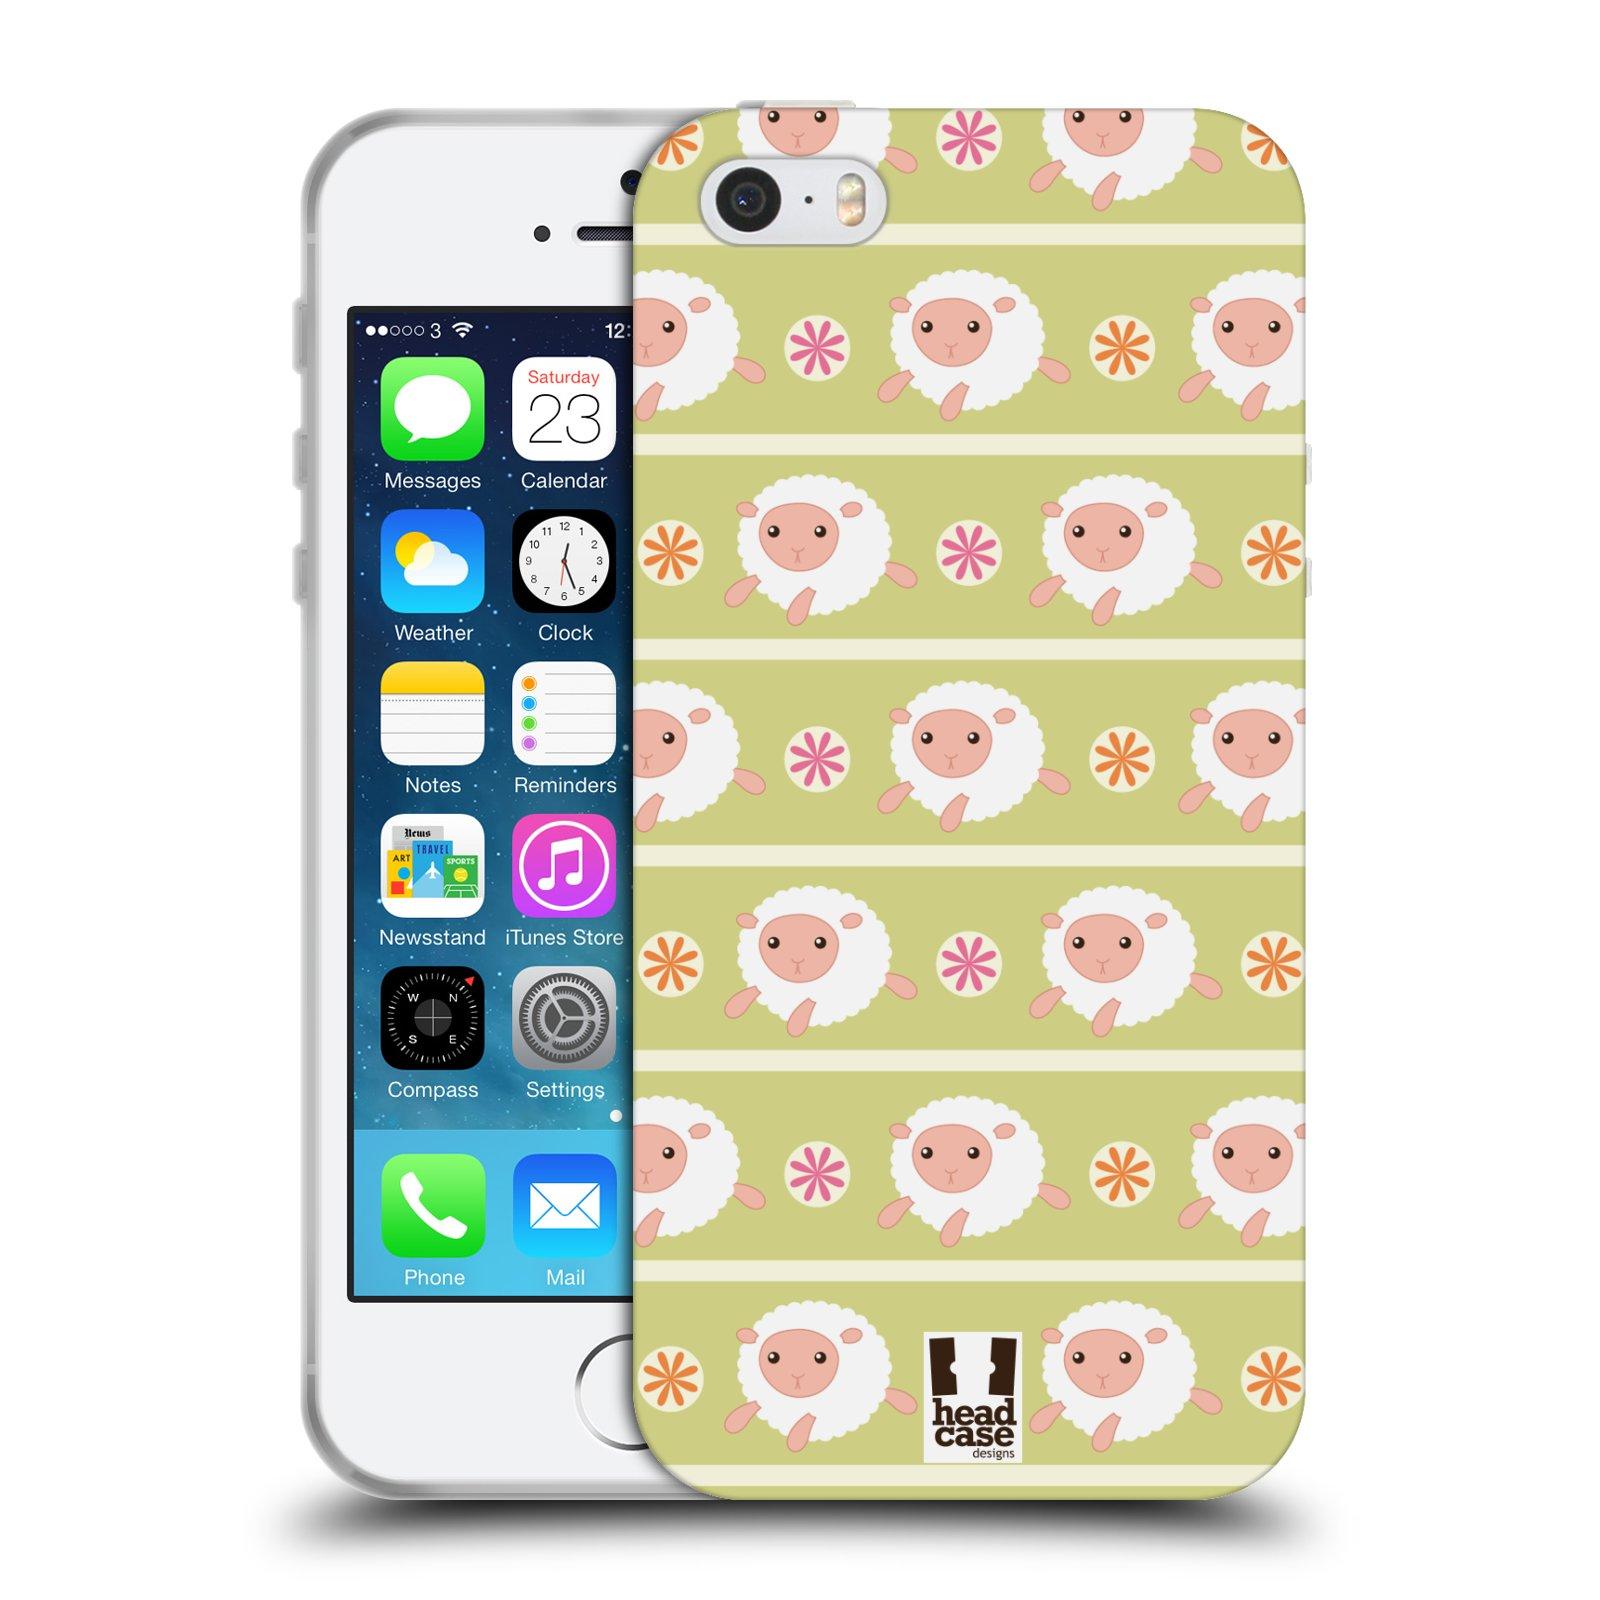 HEAD CASE silikonový obal na mobil Apple Iphone 5/5S vzor roztomilé zvířecí vzory ovečky